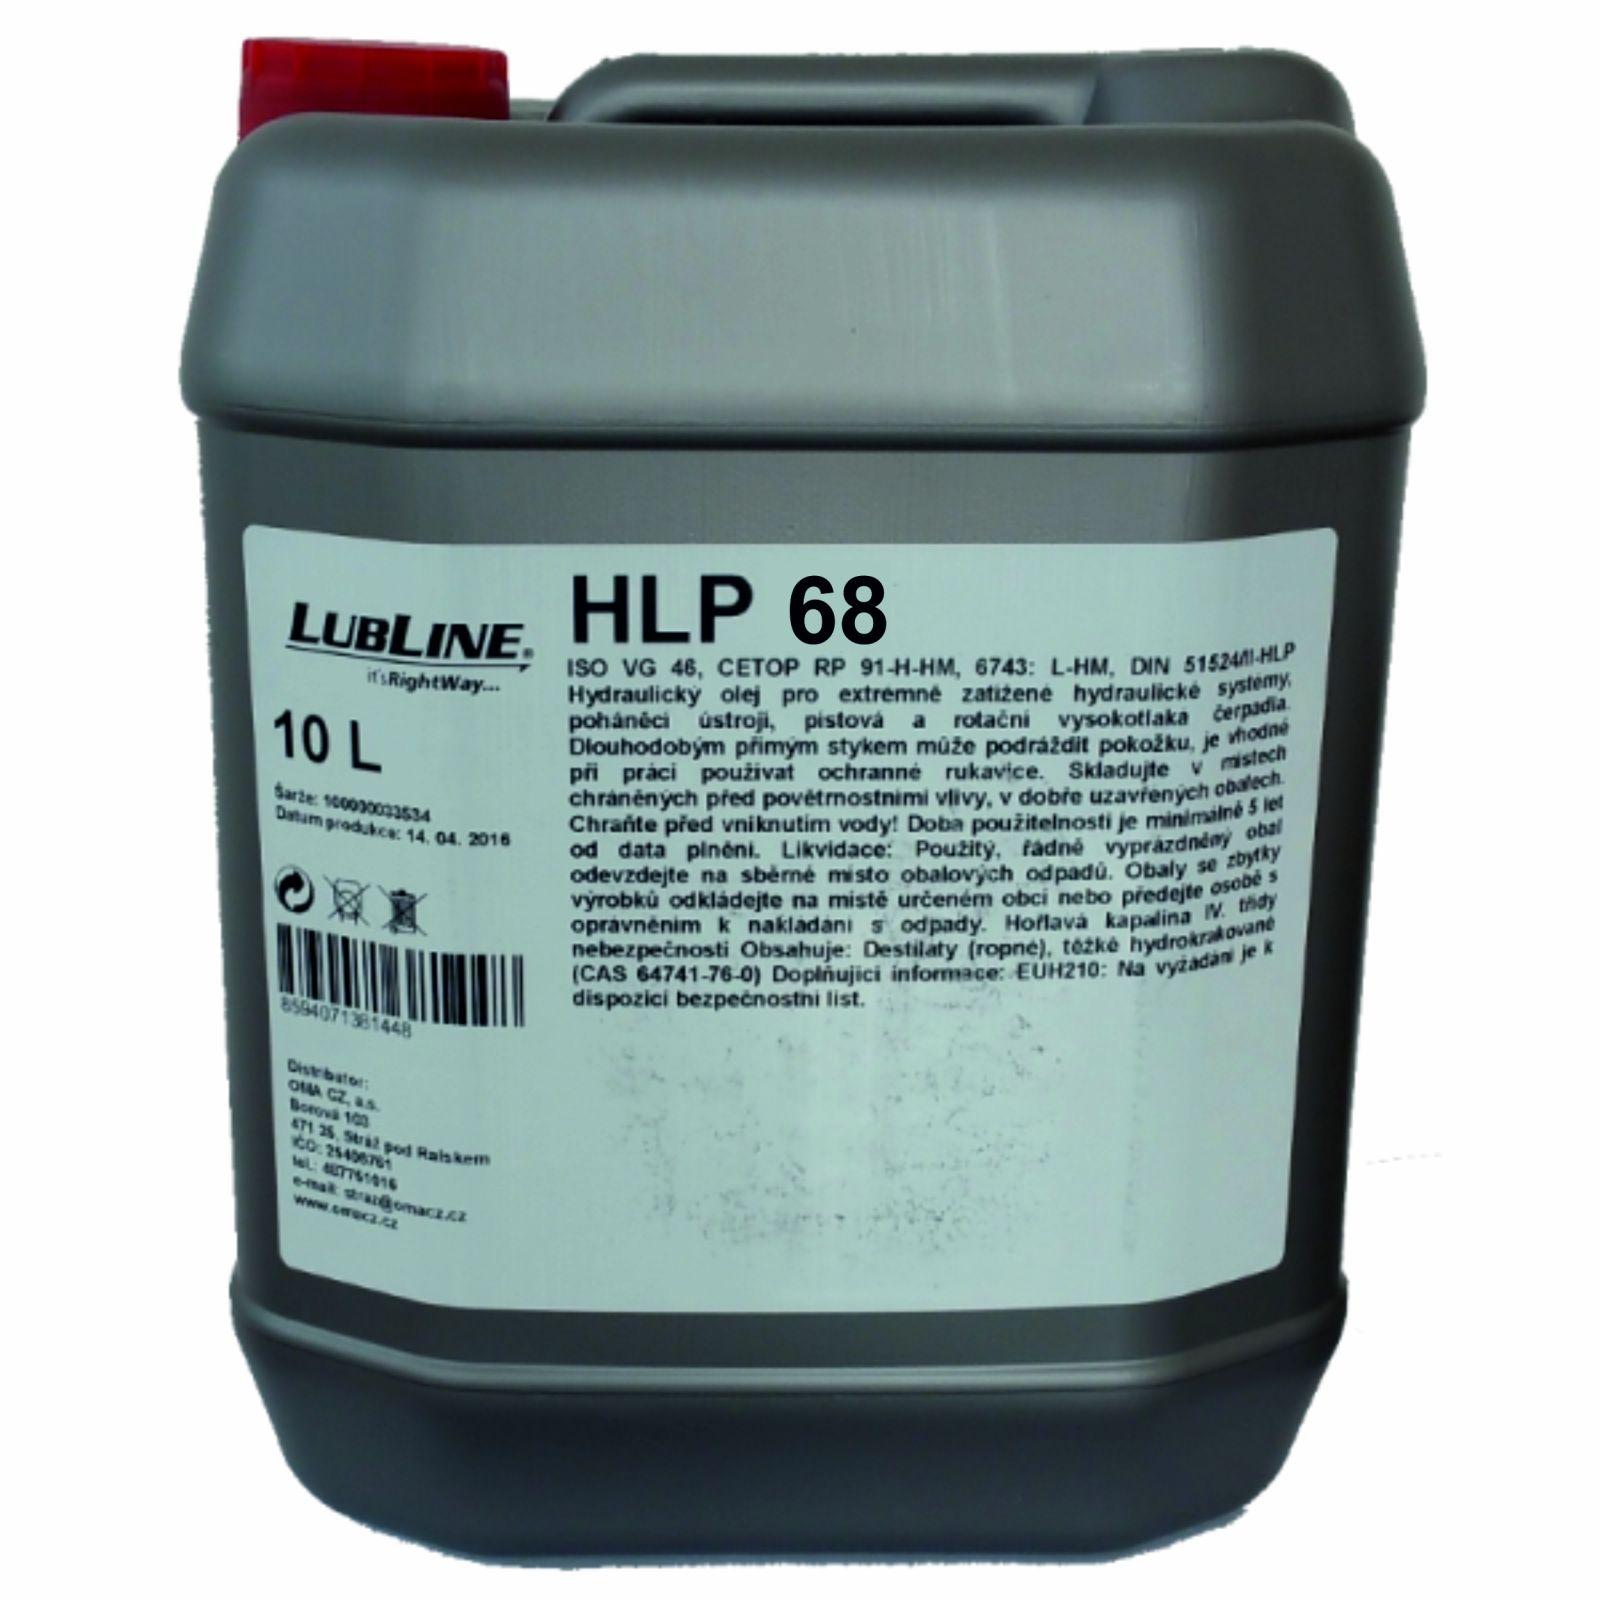 Carline Lubline HLP 68 (HM 68 -) 30 L